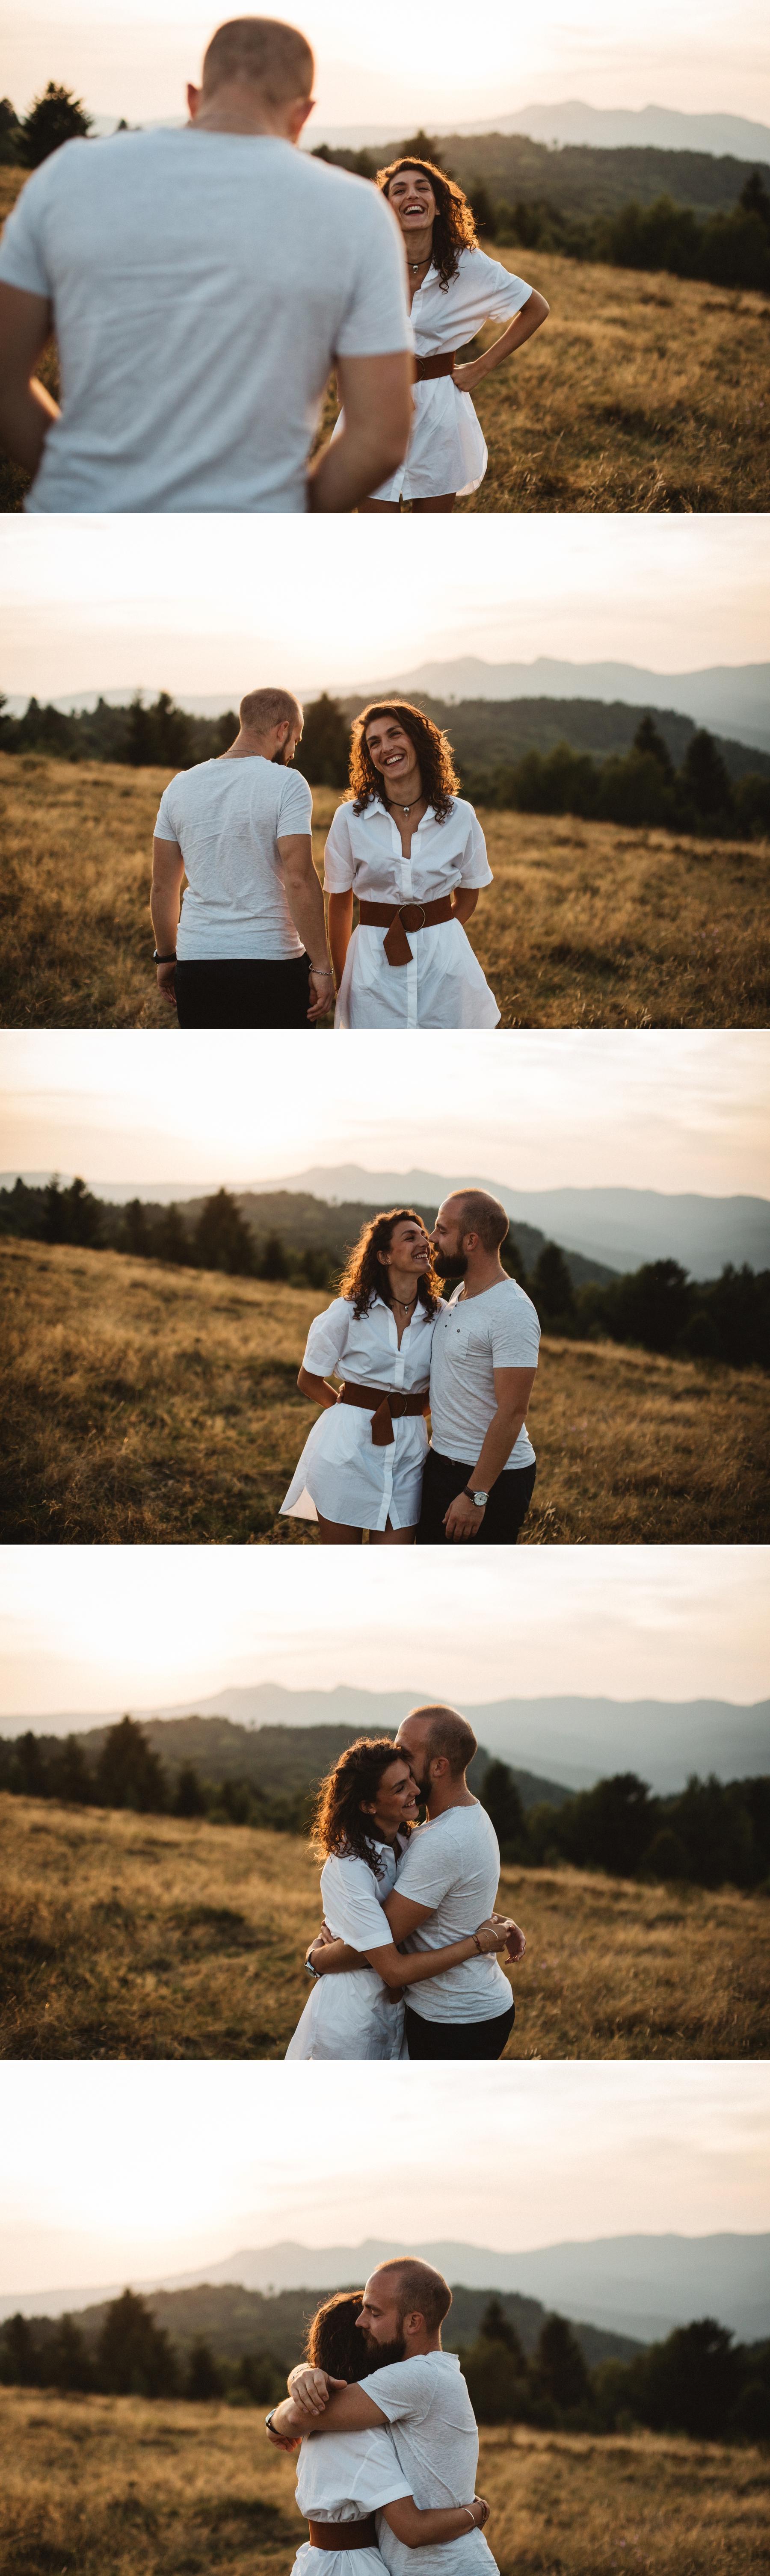 engagement-alsace-06.jpg